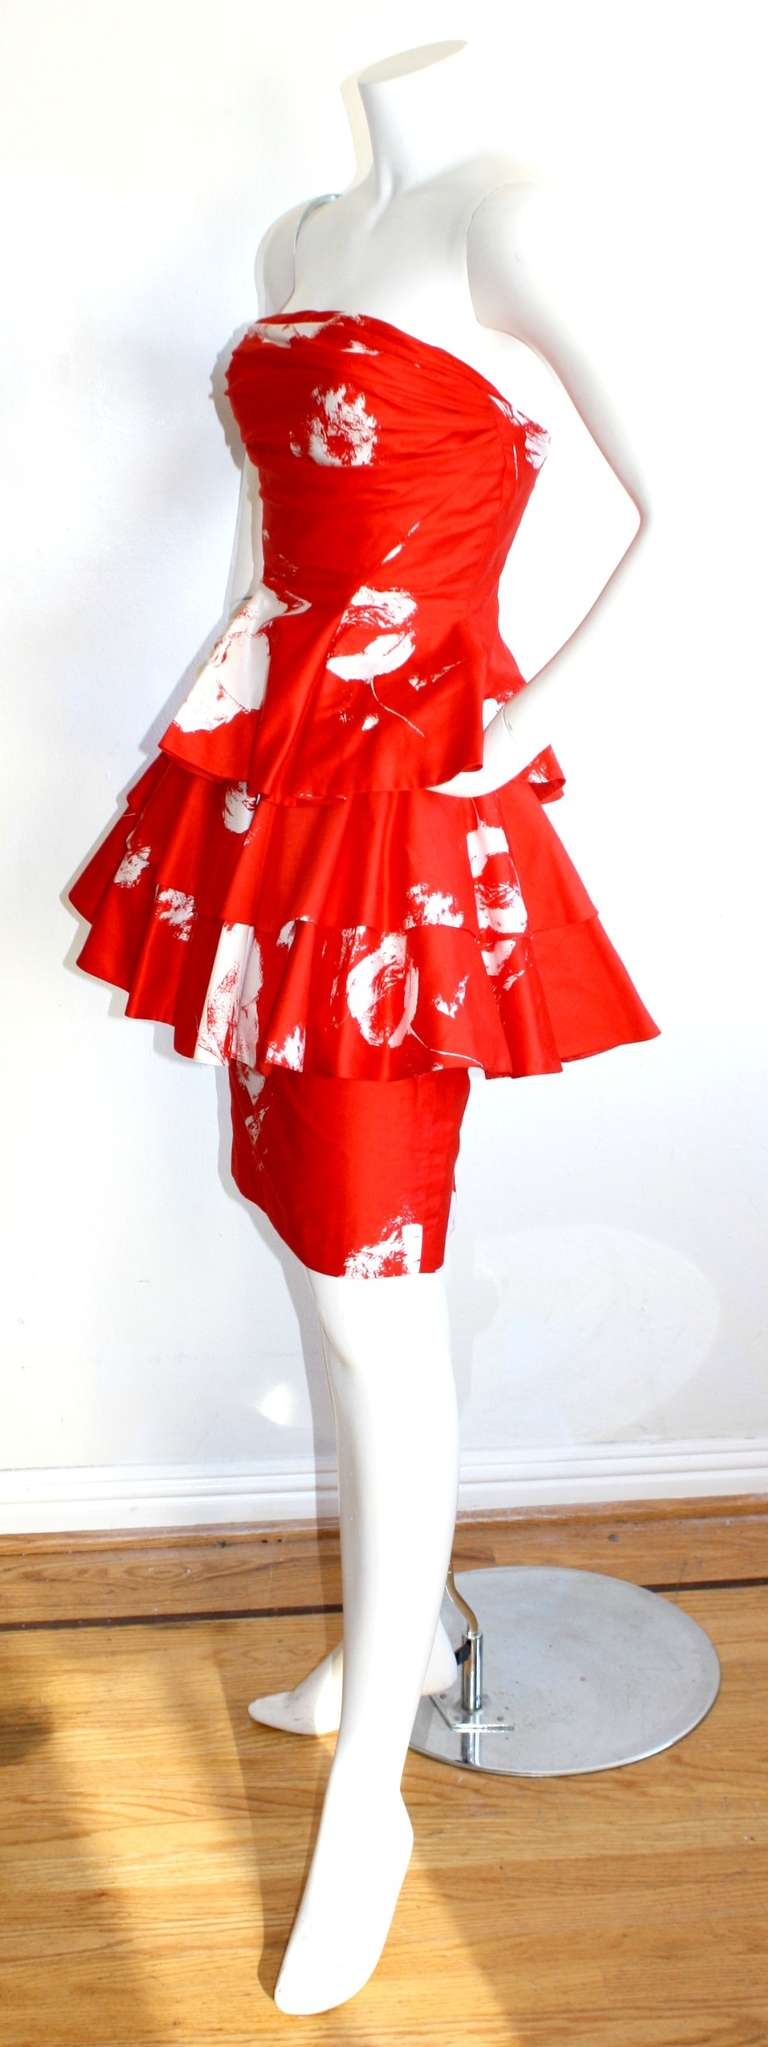 Vintage Barboglio Two Piece Peplum Red Dress Set 5